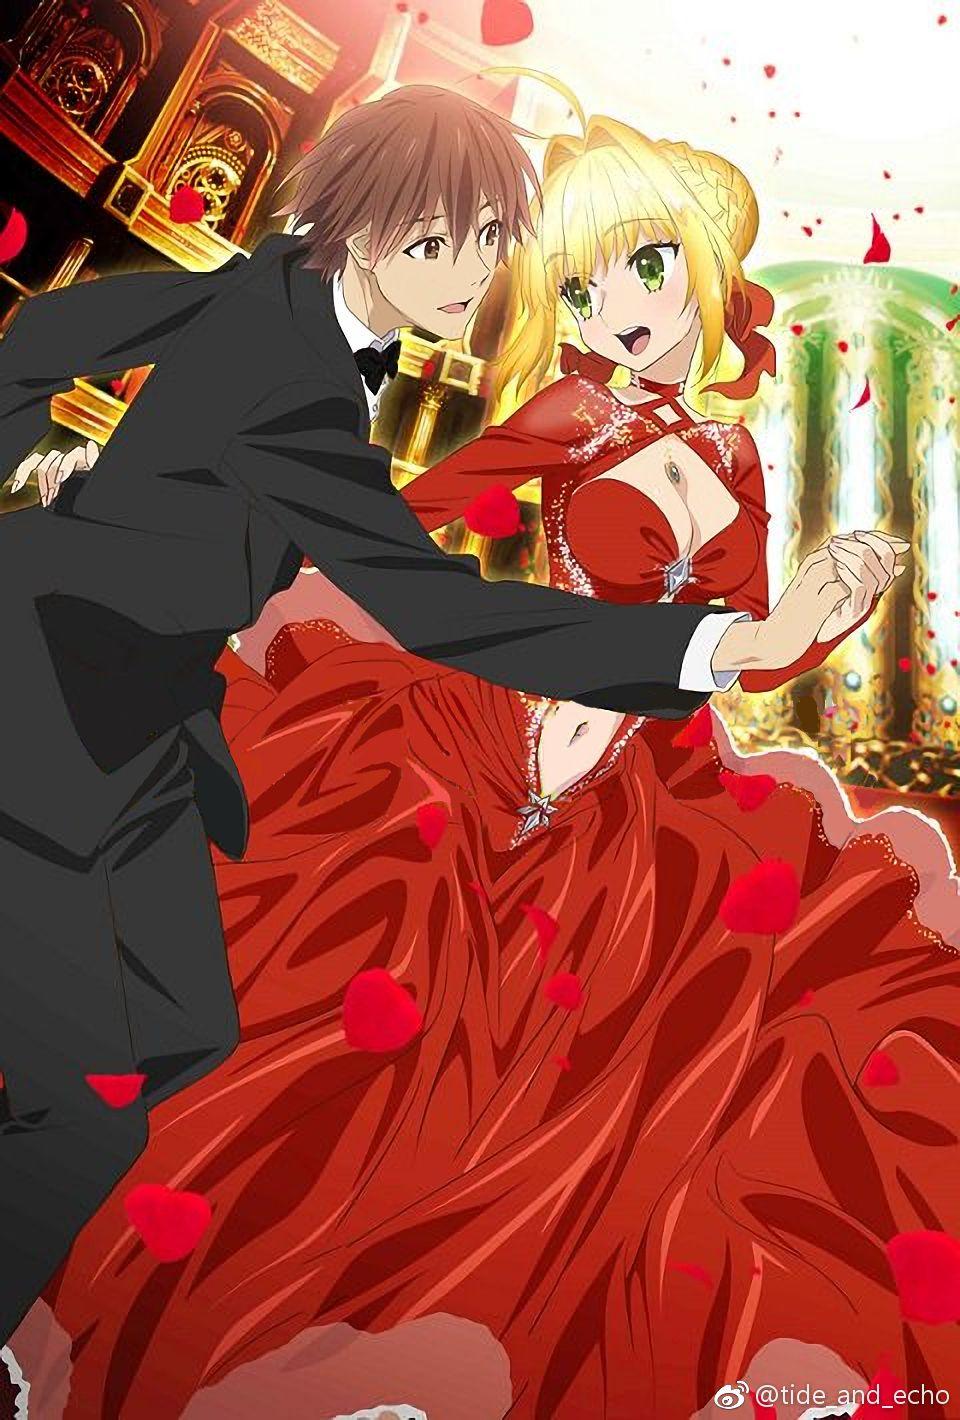 Hakuno and Nero Fate stay night series, Rwby characters